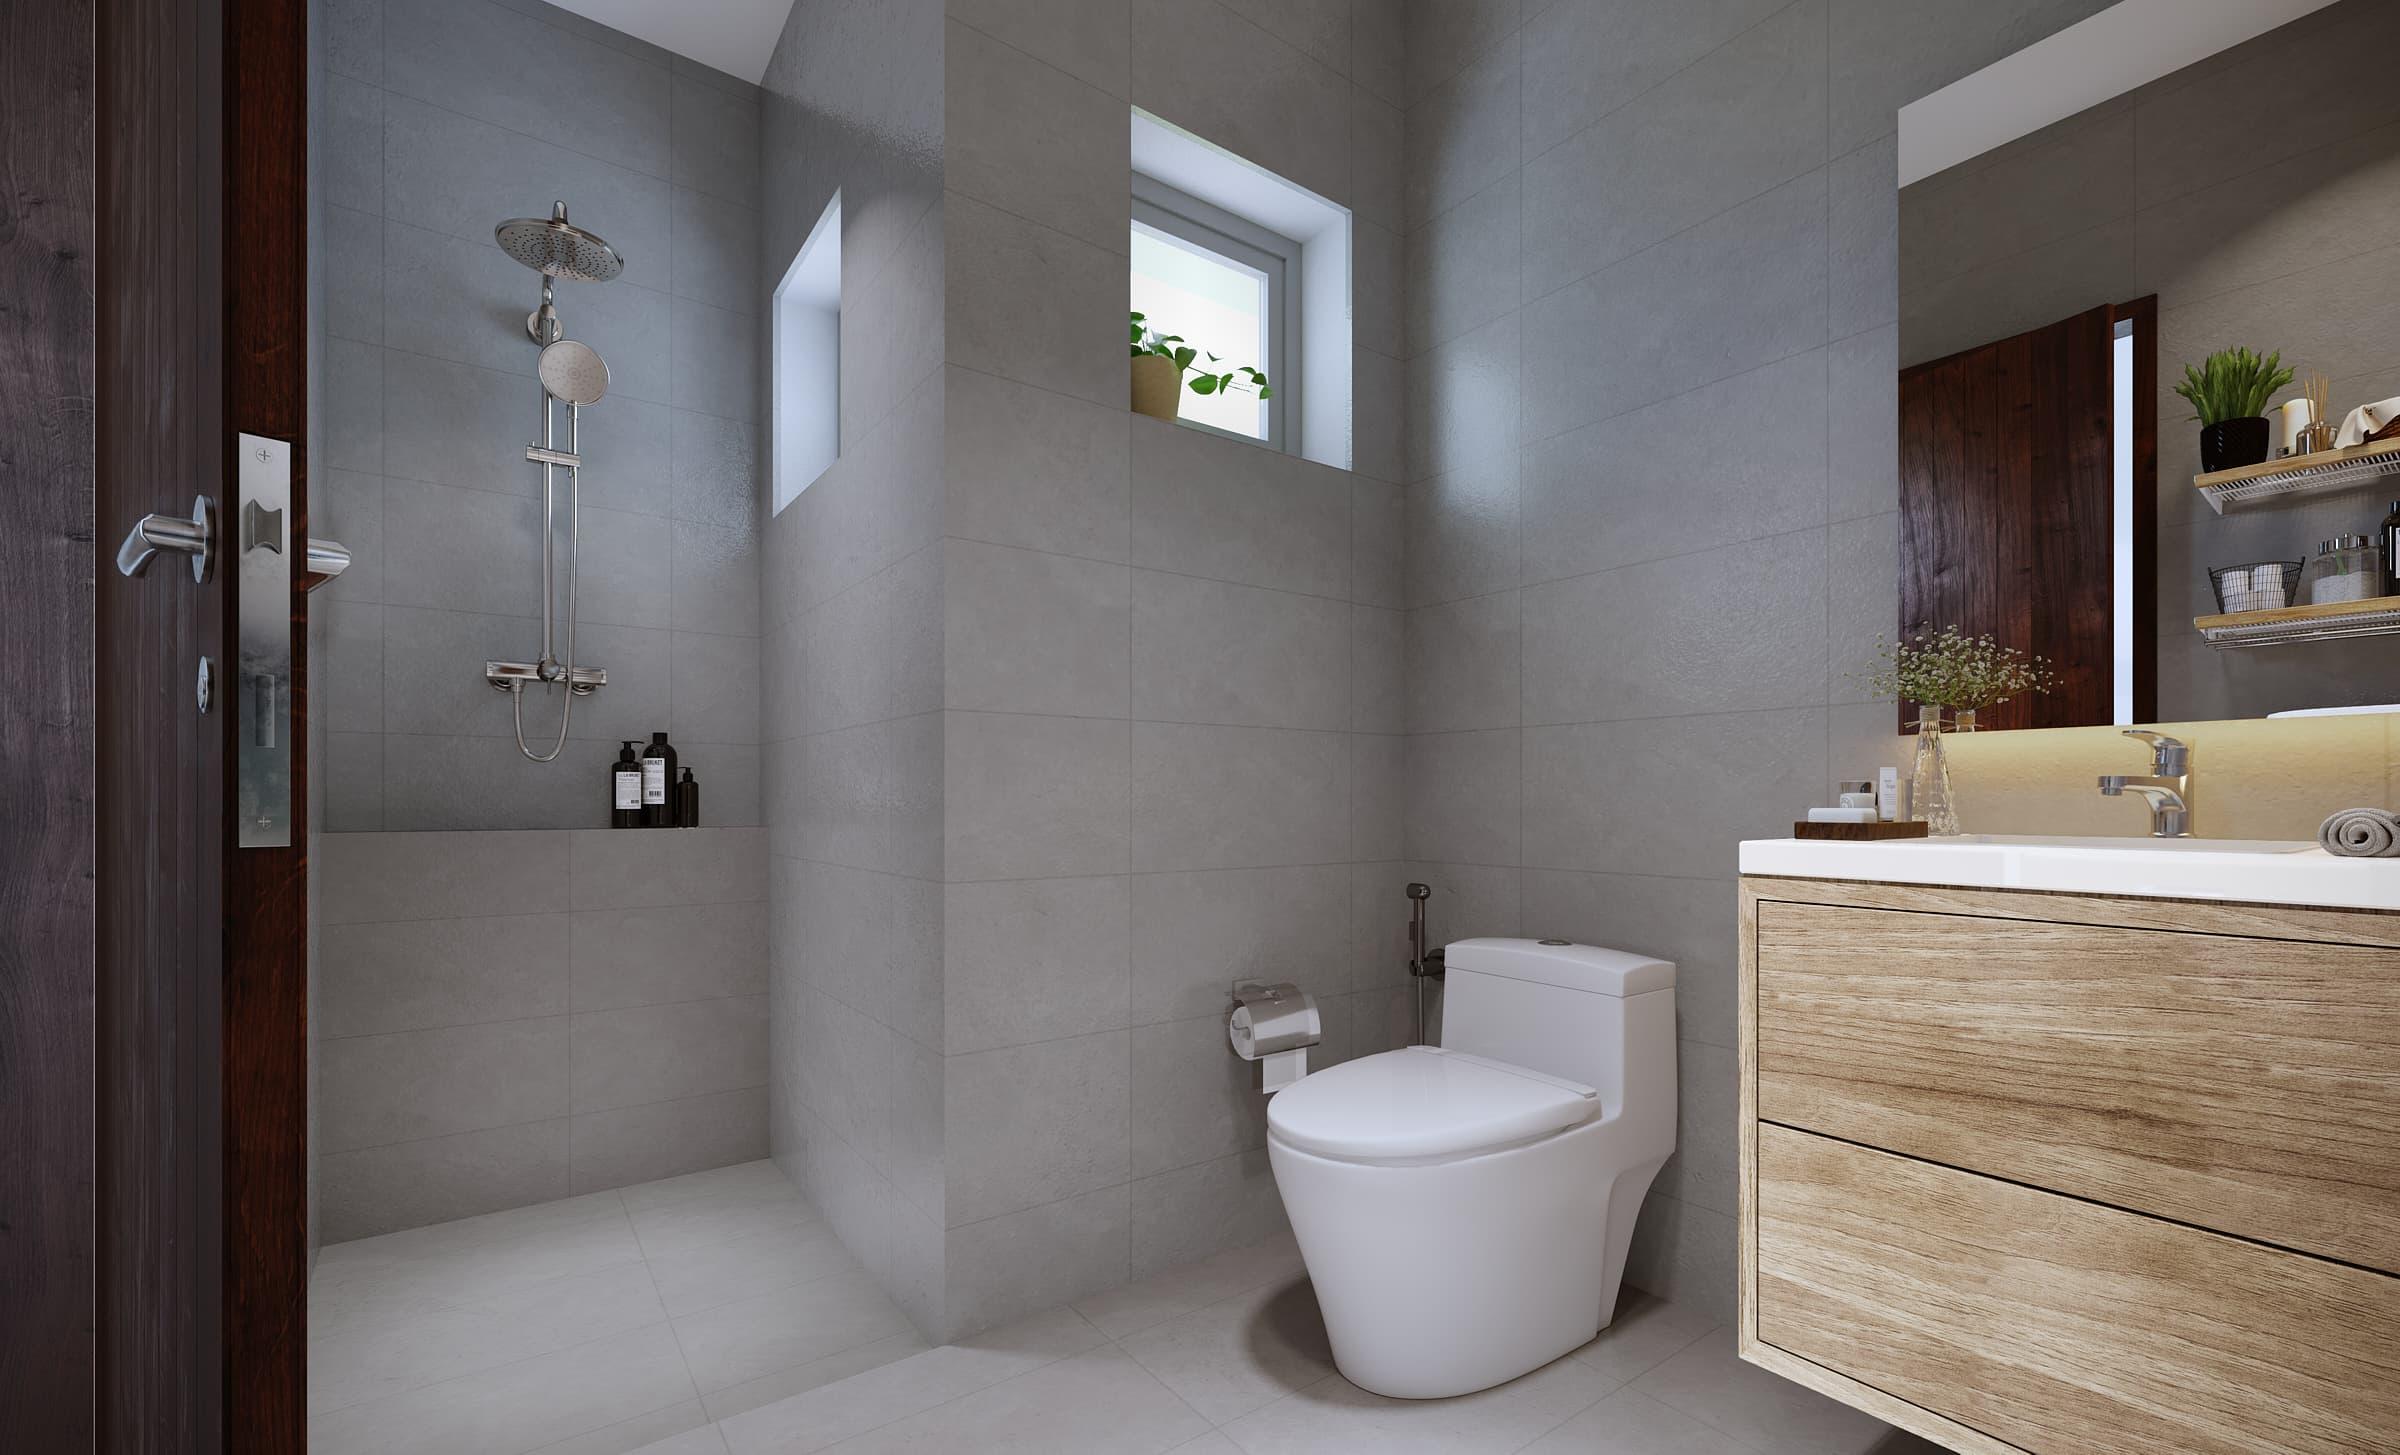 Rose Apple Square Siem Reap Residences 2 Bedroom Bathroom